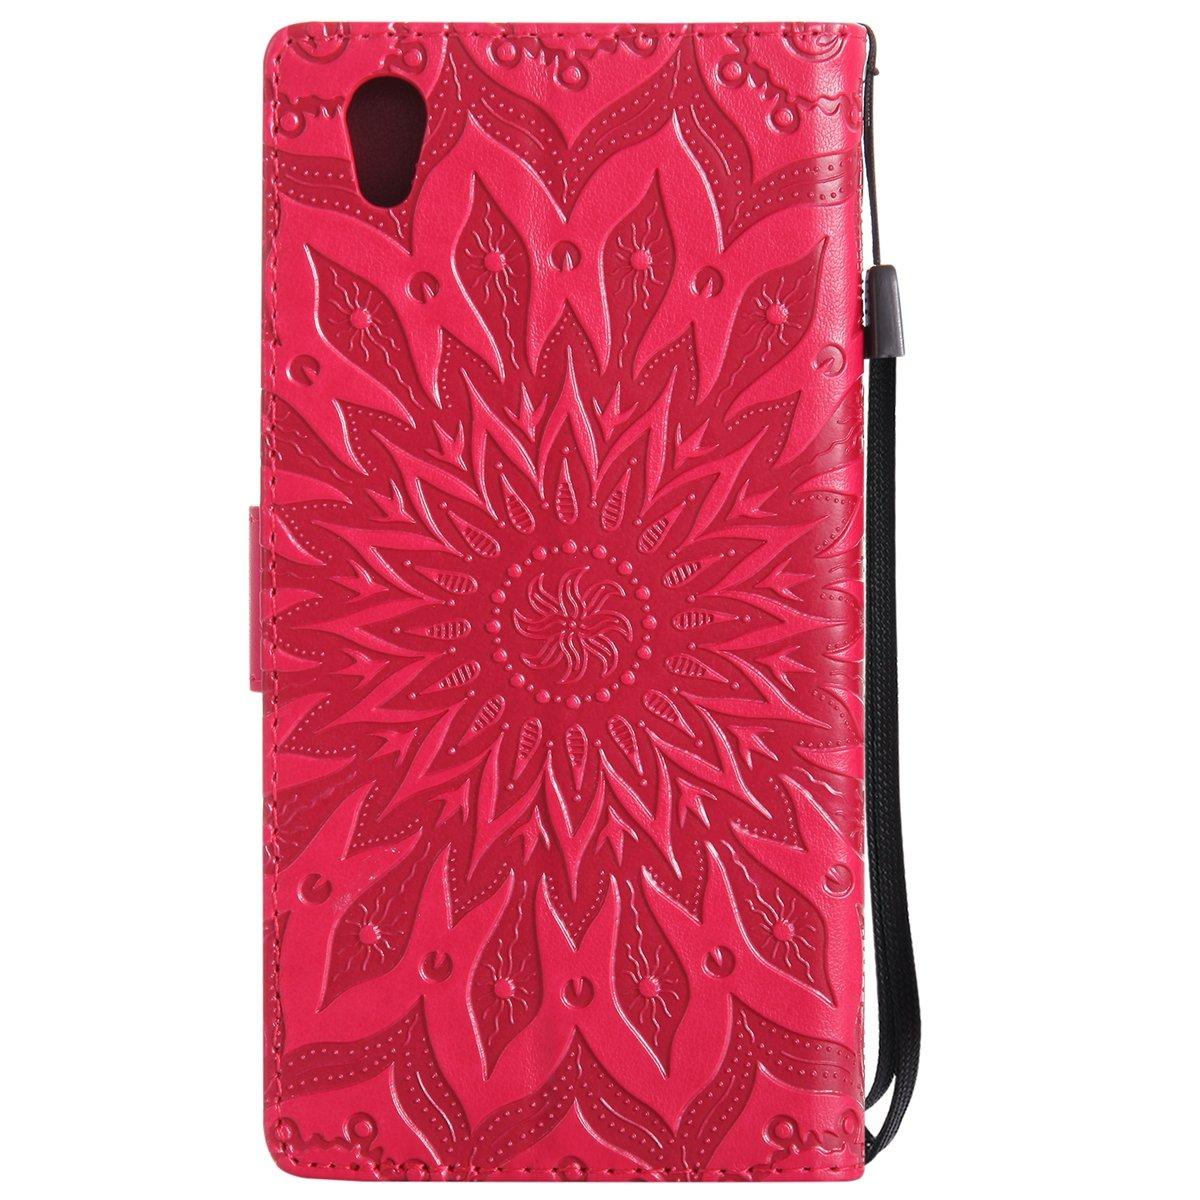 Kompatibel mit Sony Xperia L1 H/ülle,Sony Xperia L1 Schutzh/ülle,Pr/ägung Mandala Blumen Sonnenblume PU Lederh/ülle Flip H/ülle Cover St/änder Etui Wallet Tasche Case Schutzh/ülle f/ür Sony Xperia L1,Rosa